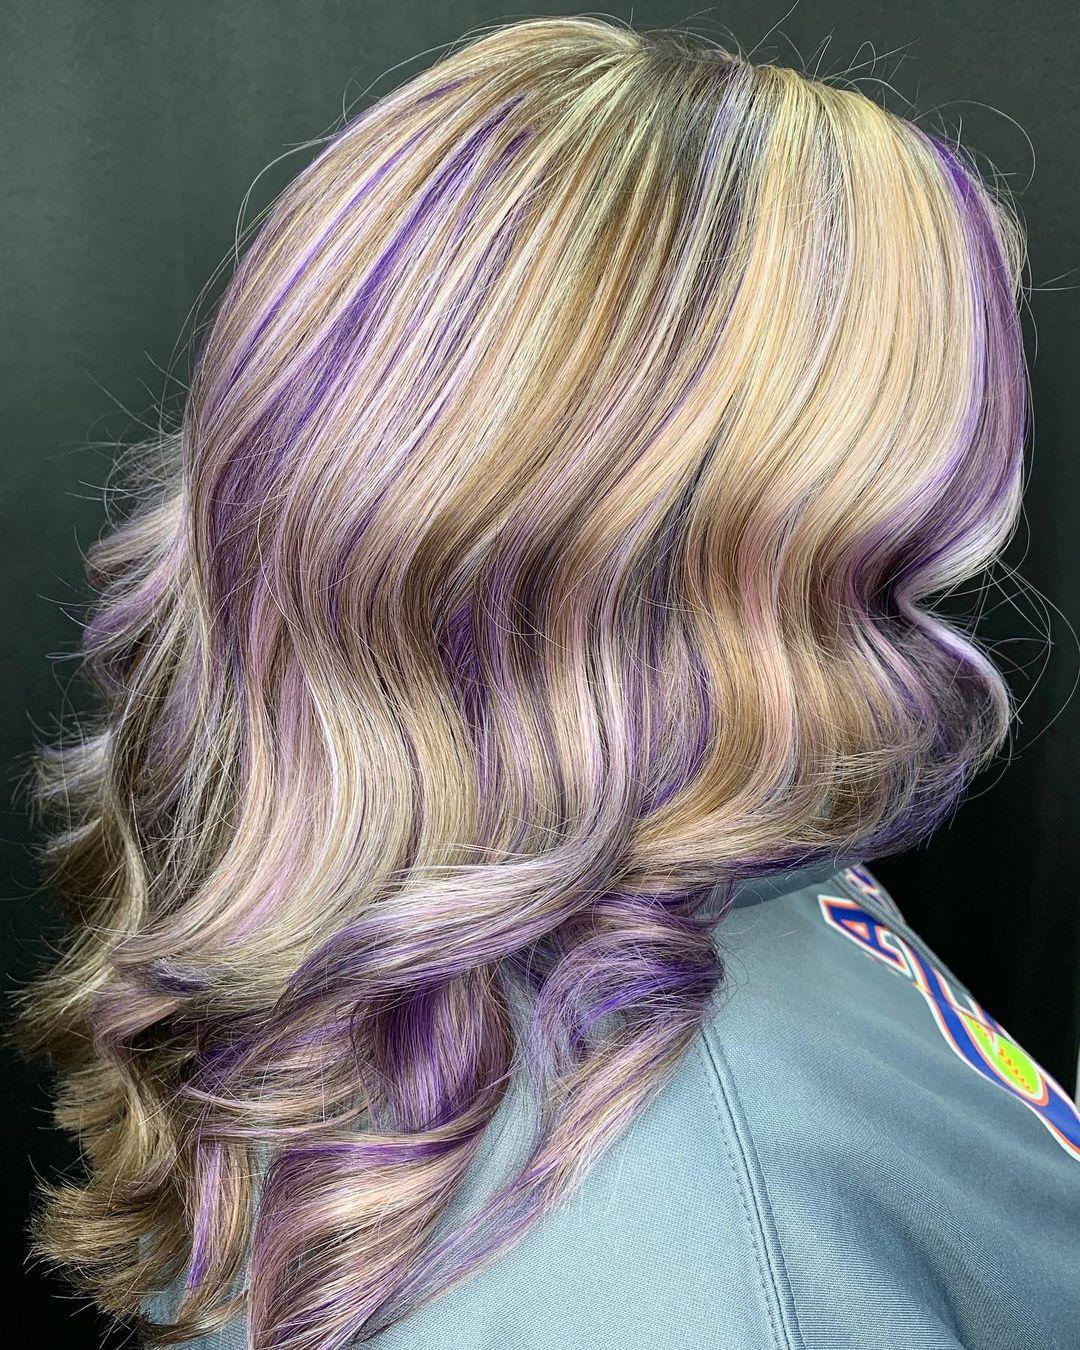 Blonde and Purple Hair Idea